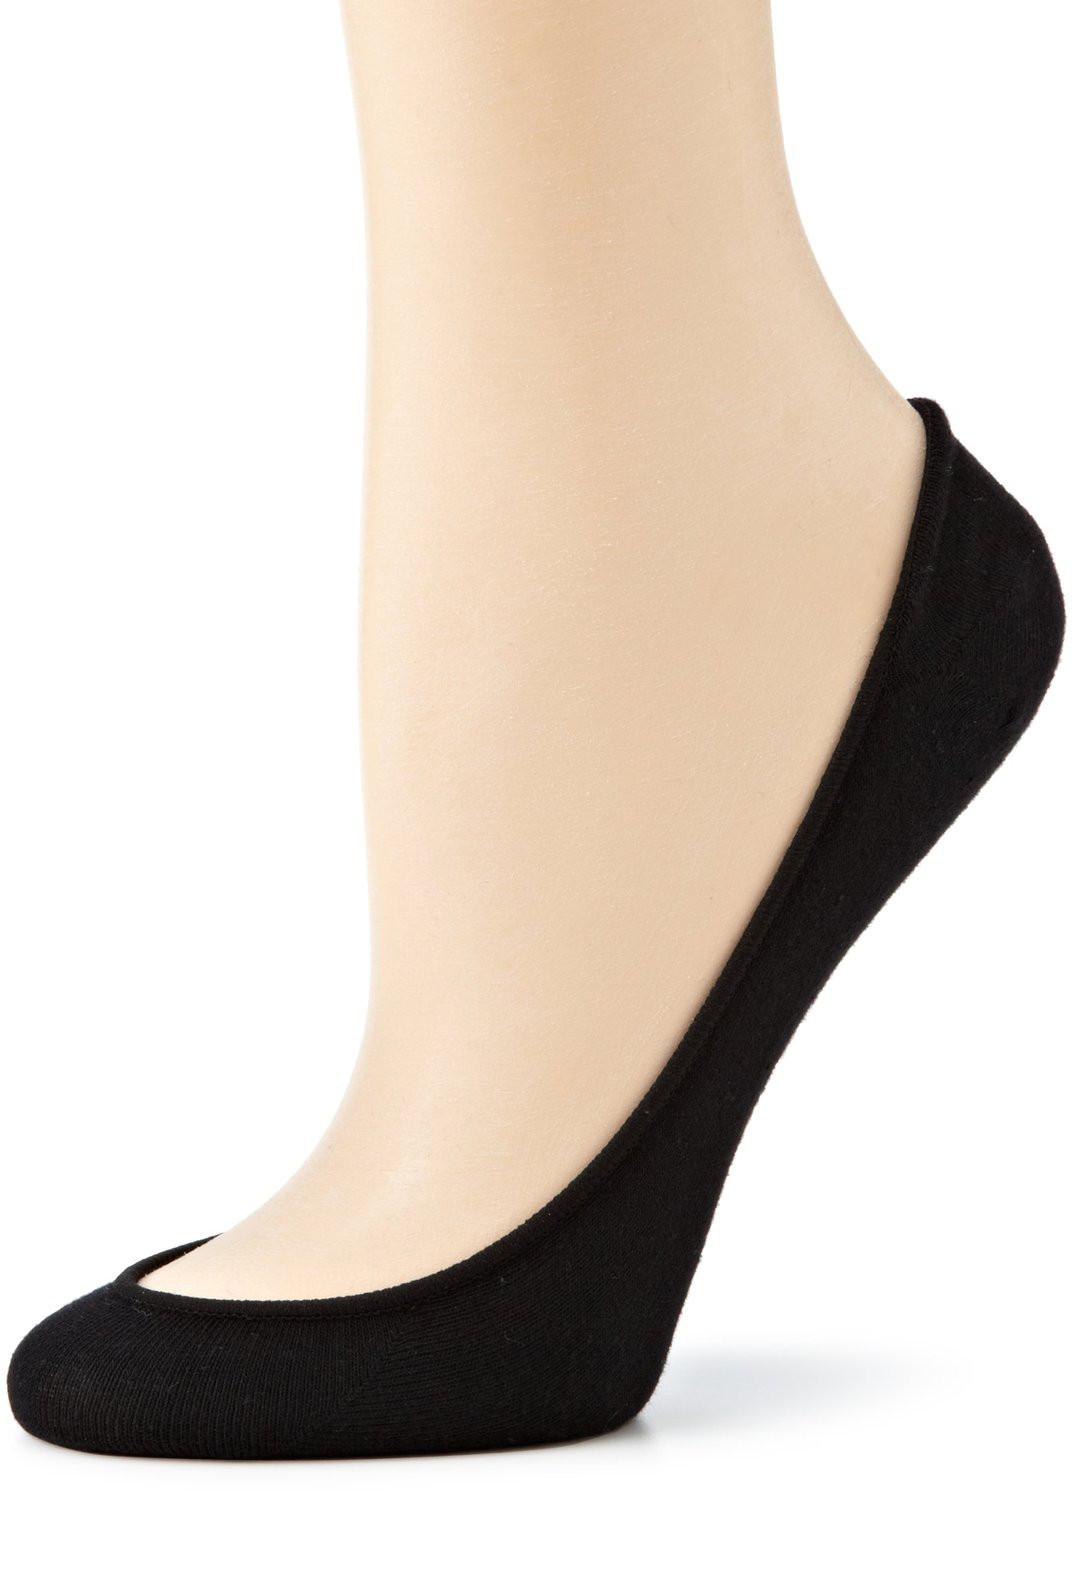 Daily Comfort No Show Foot Liner Socks In Black